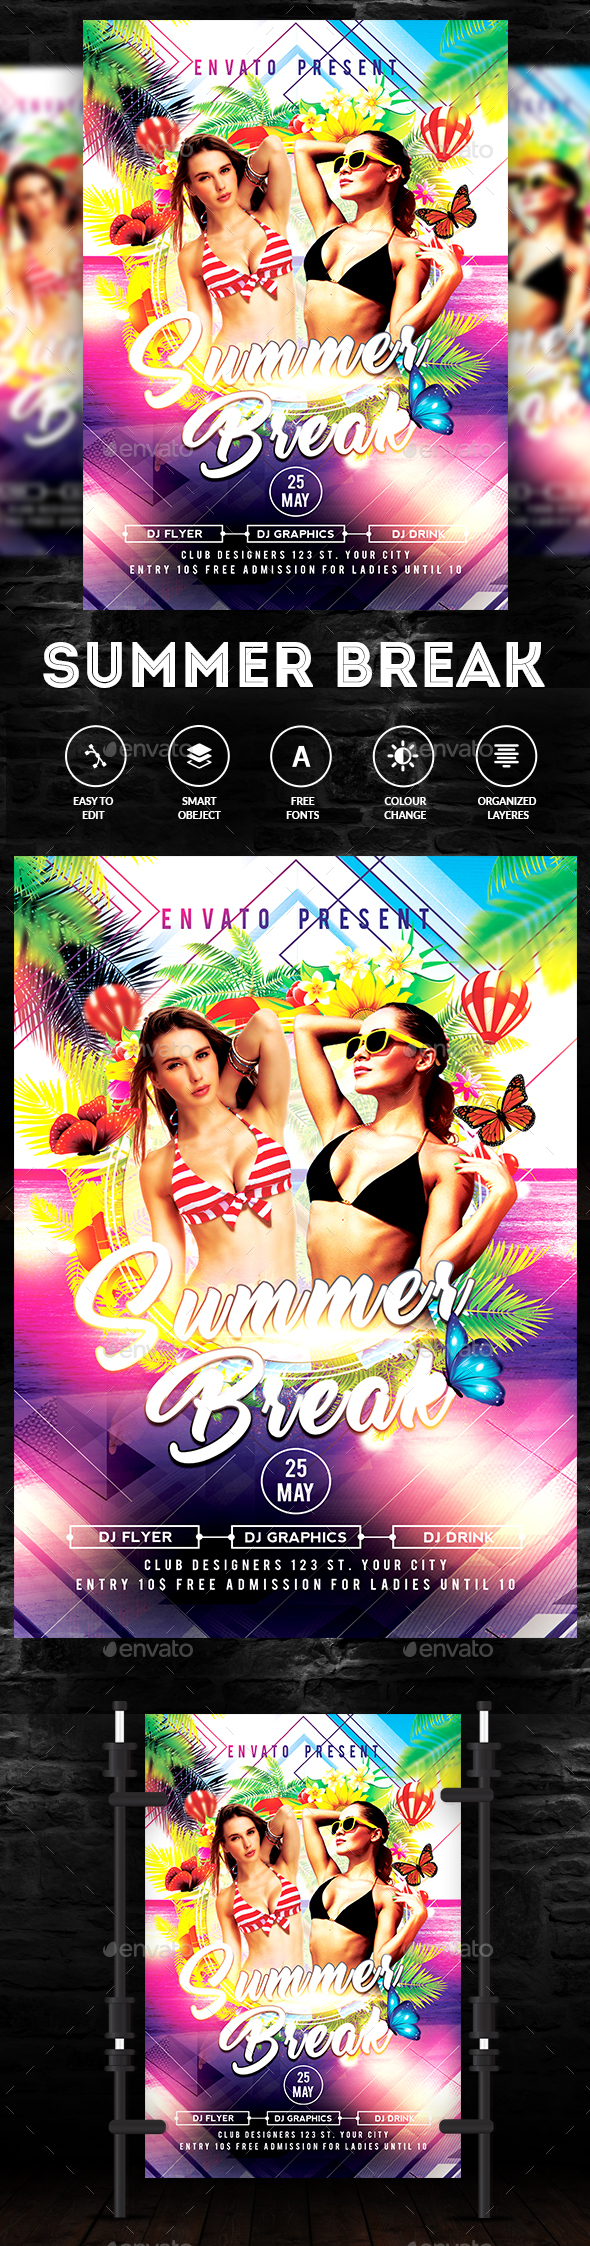 Summer Break - Flyer Template